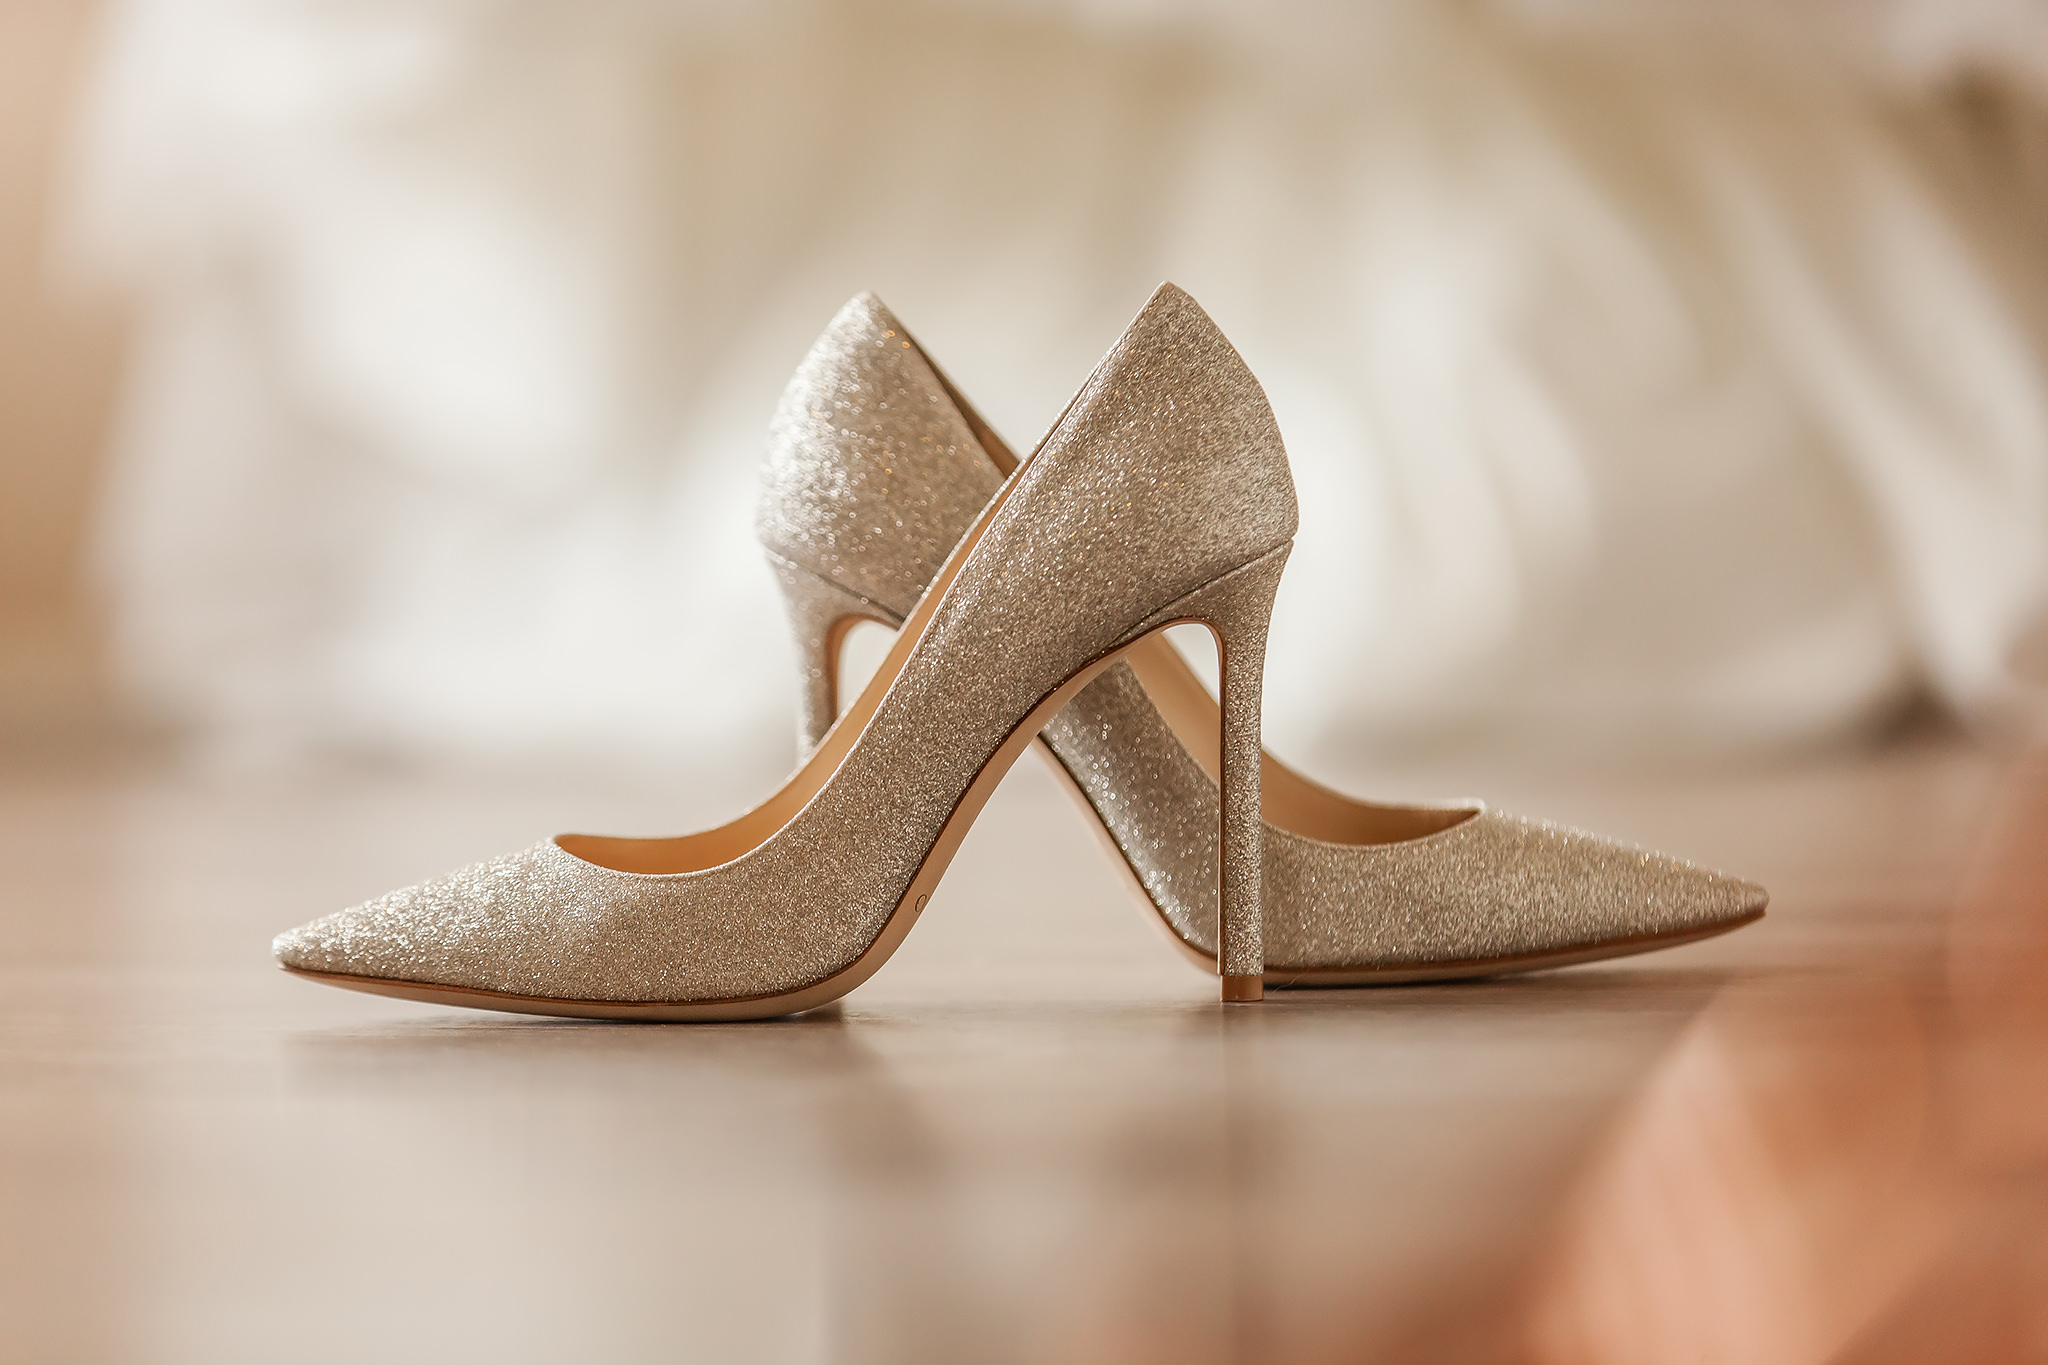 Bruidsreportage Bruidsfotografie Wedding Photographer 052 Bas Driessen Photography